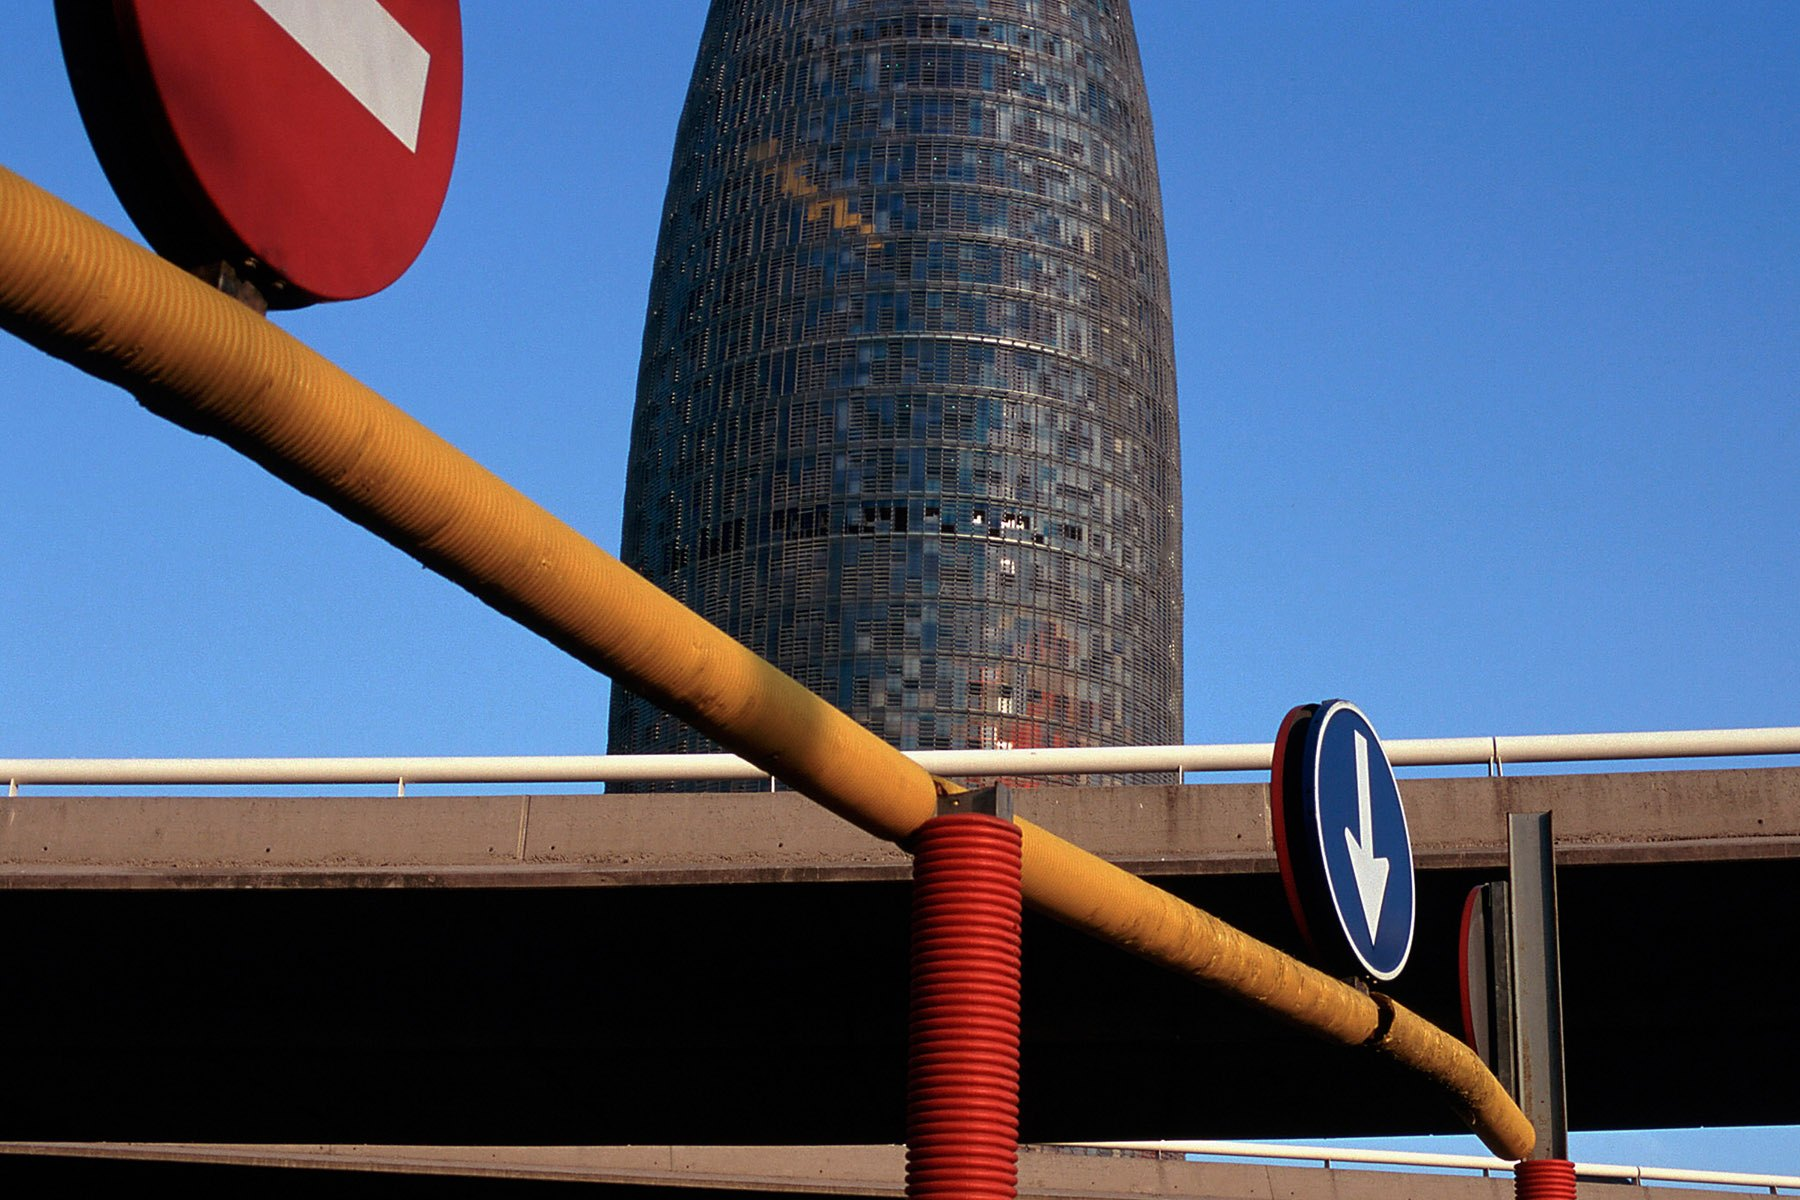 En-Barcelona-004